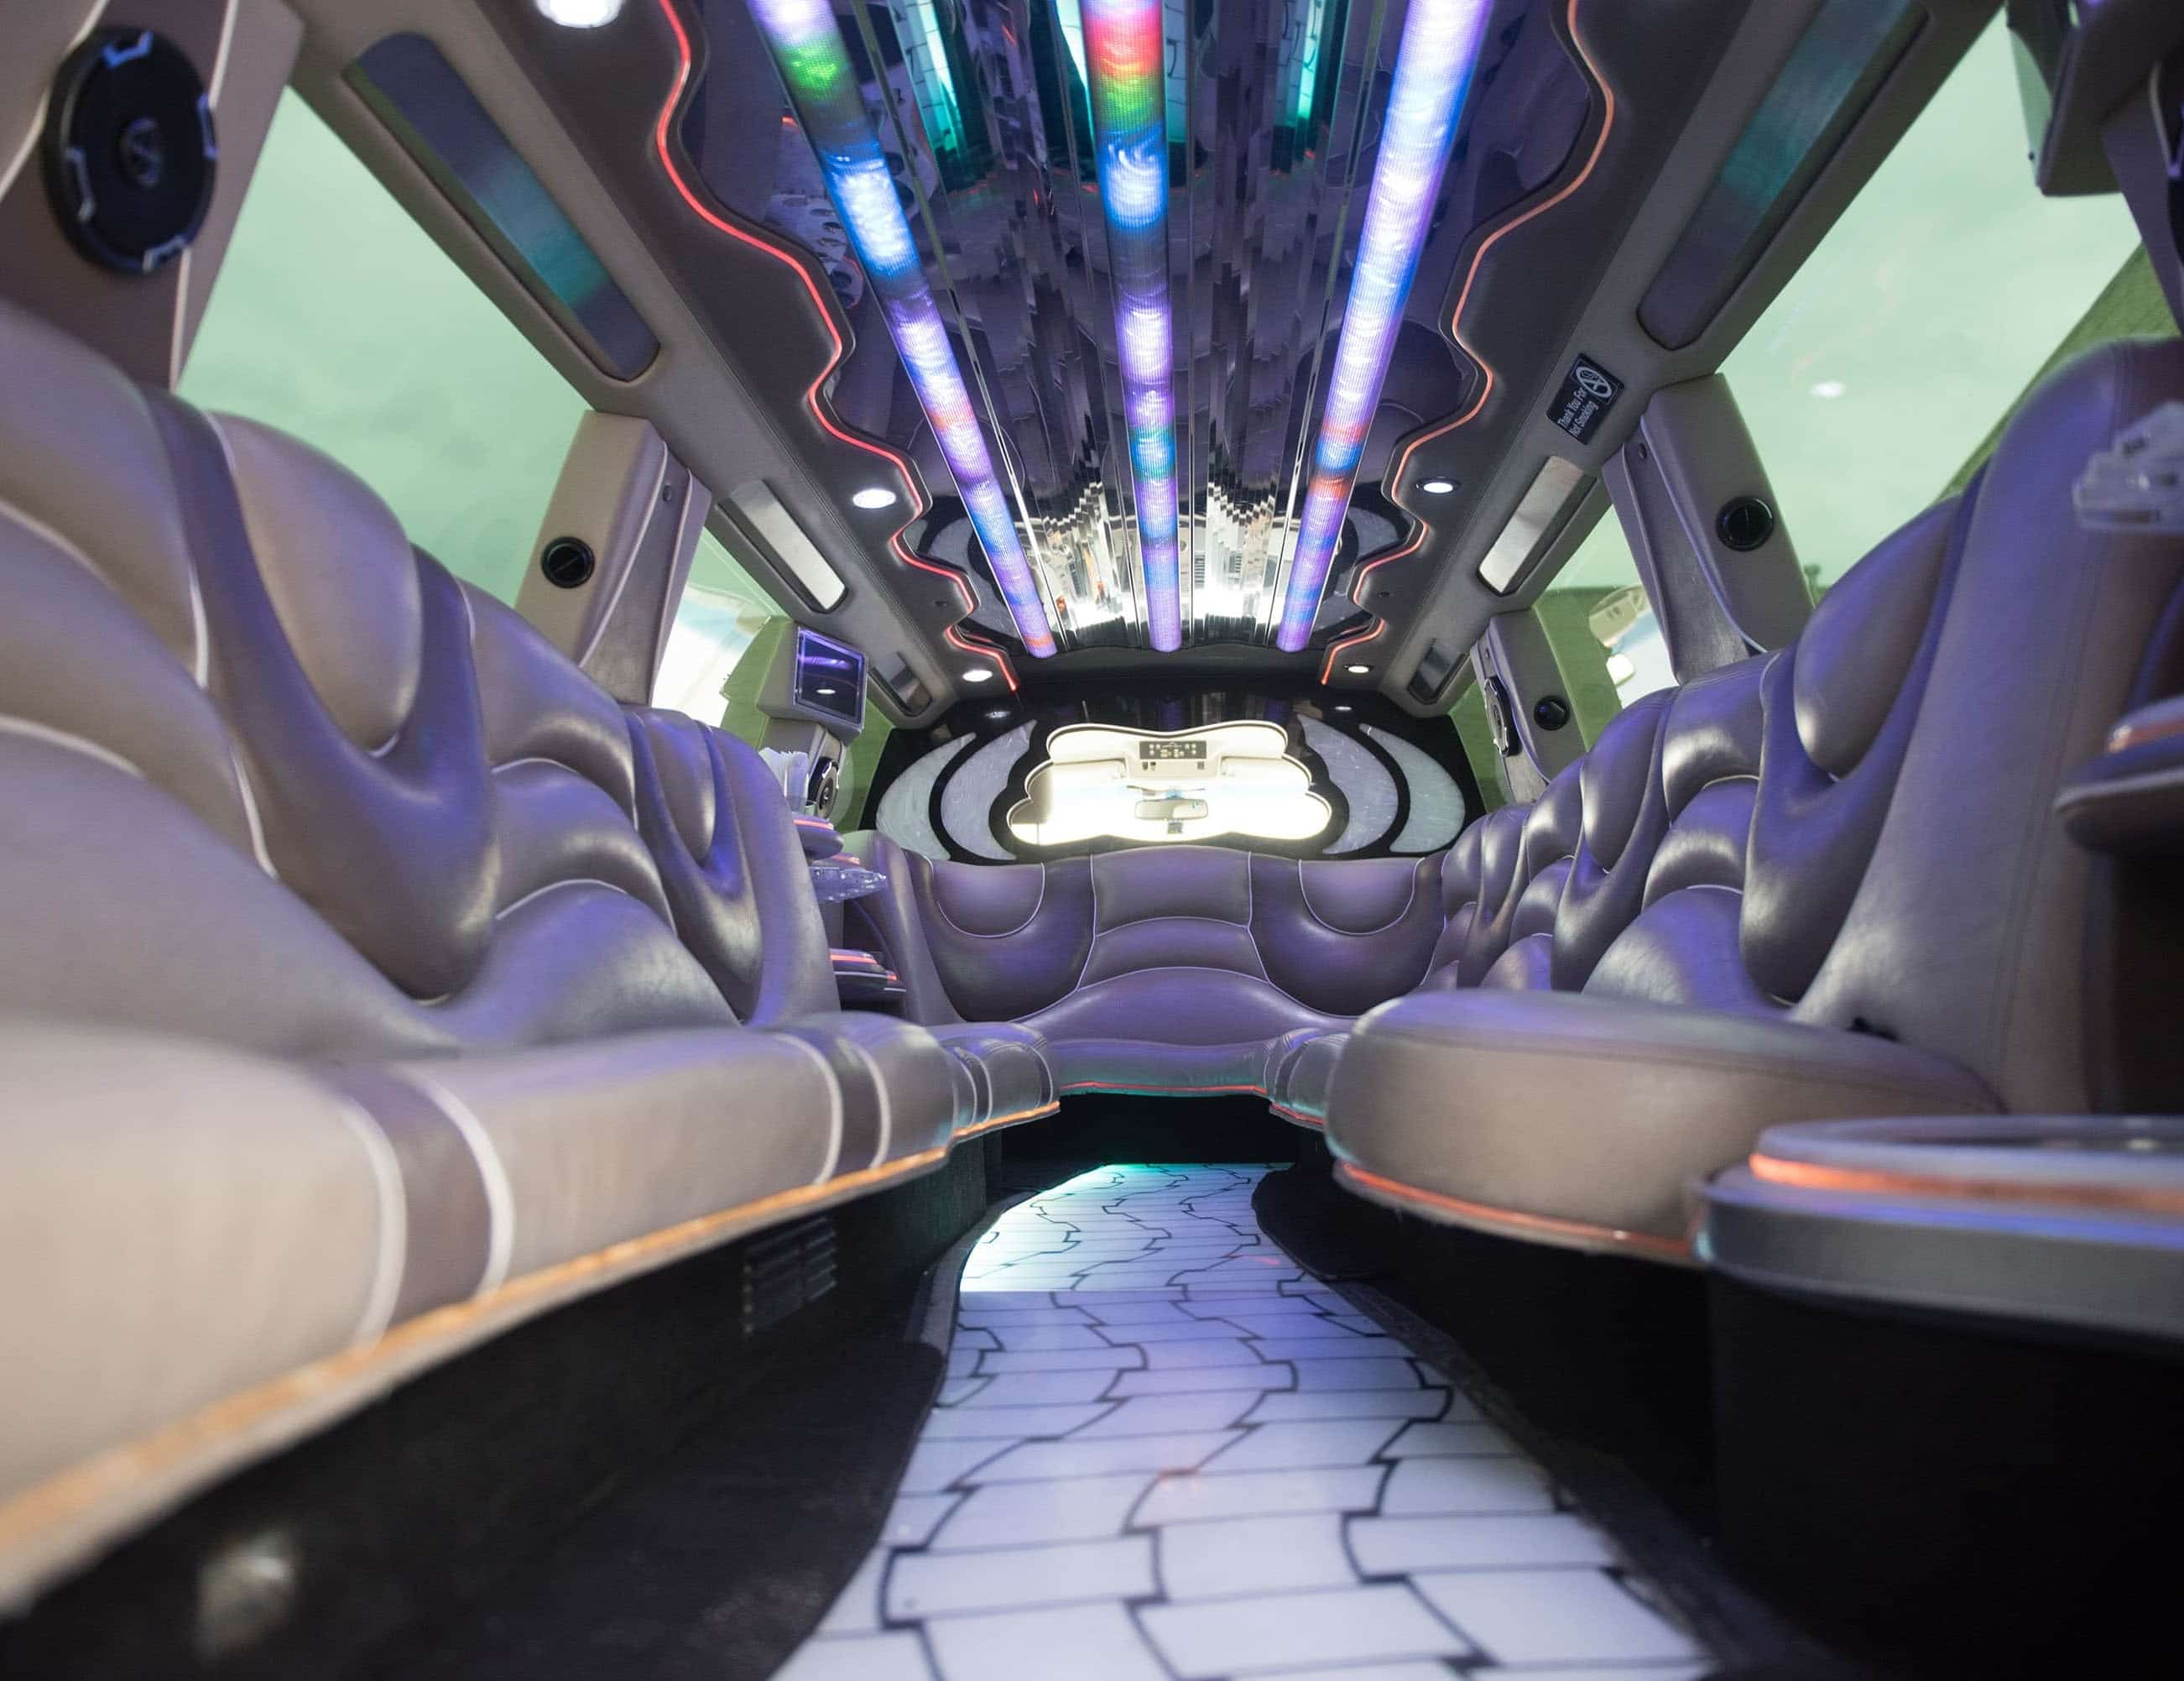 Used 2006 Infiniti SUV Stretch Limo  - Farmingdale, New York    - $12,500